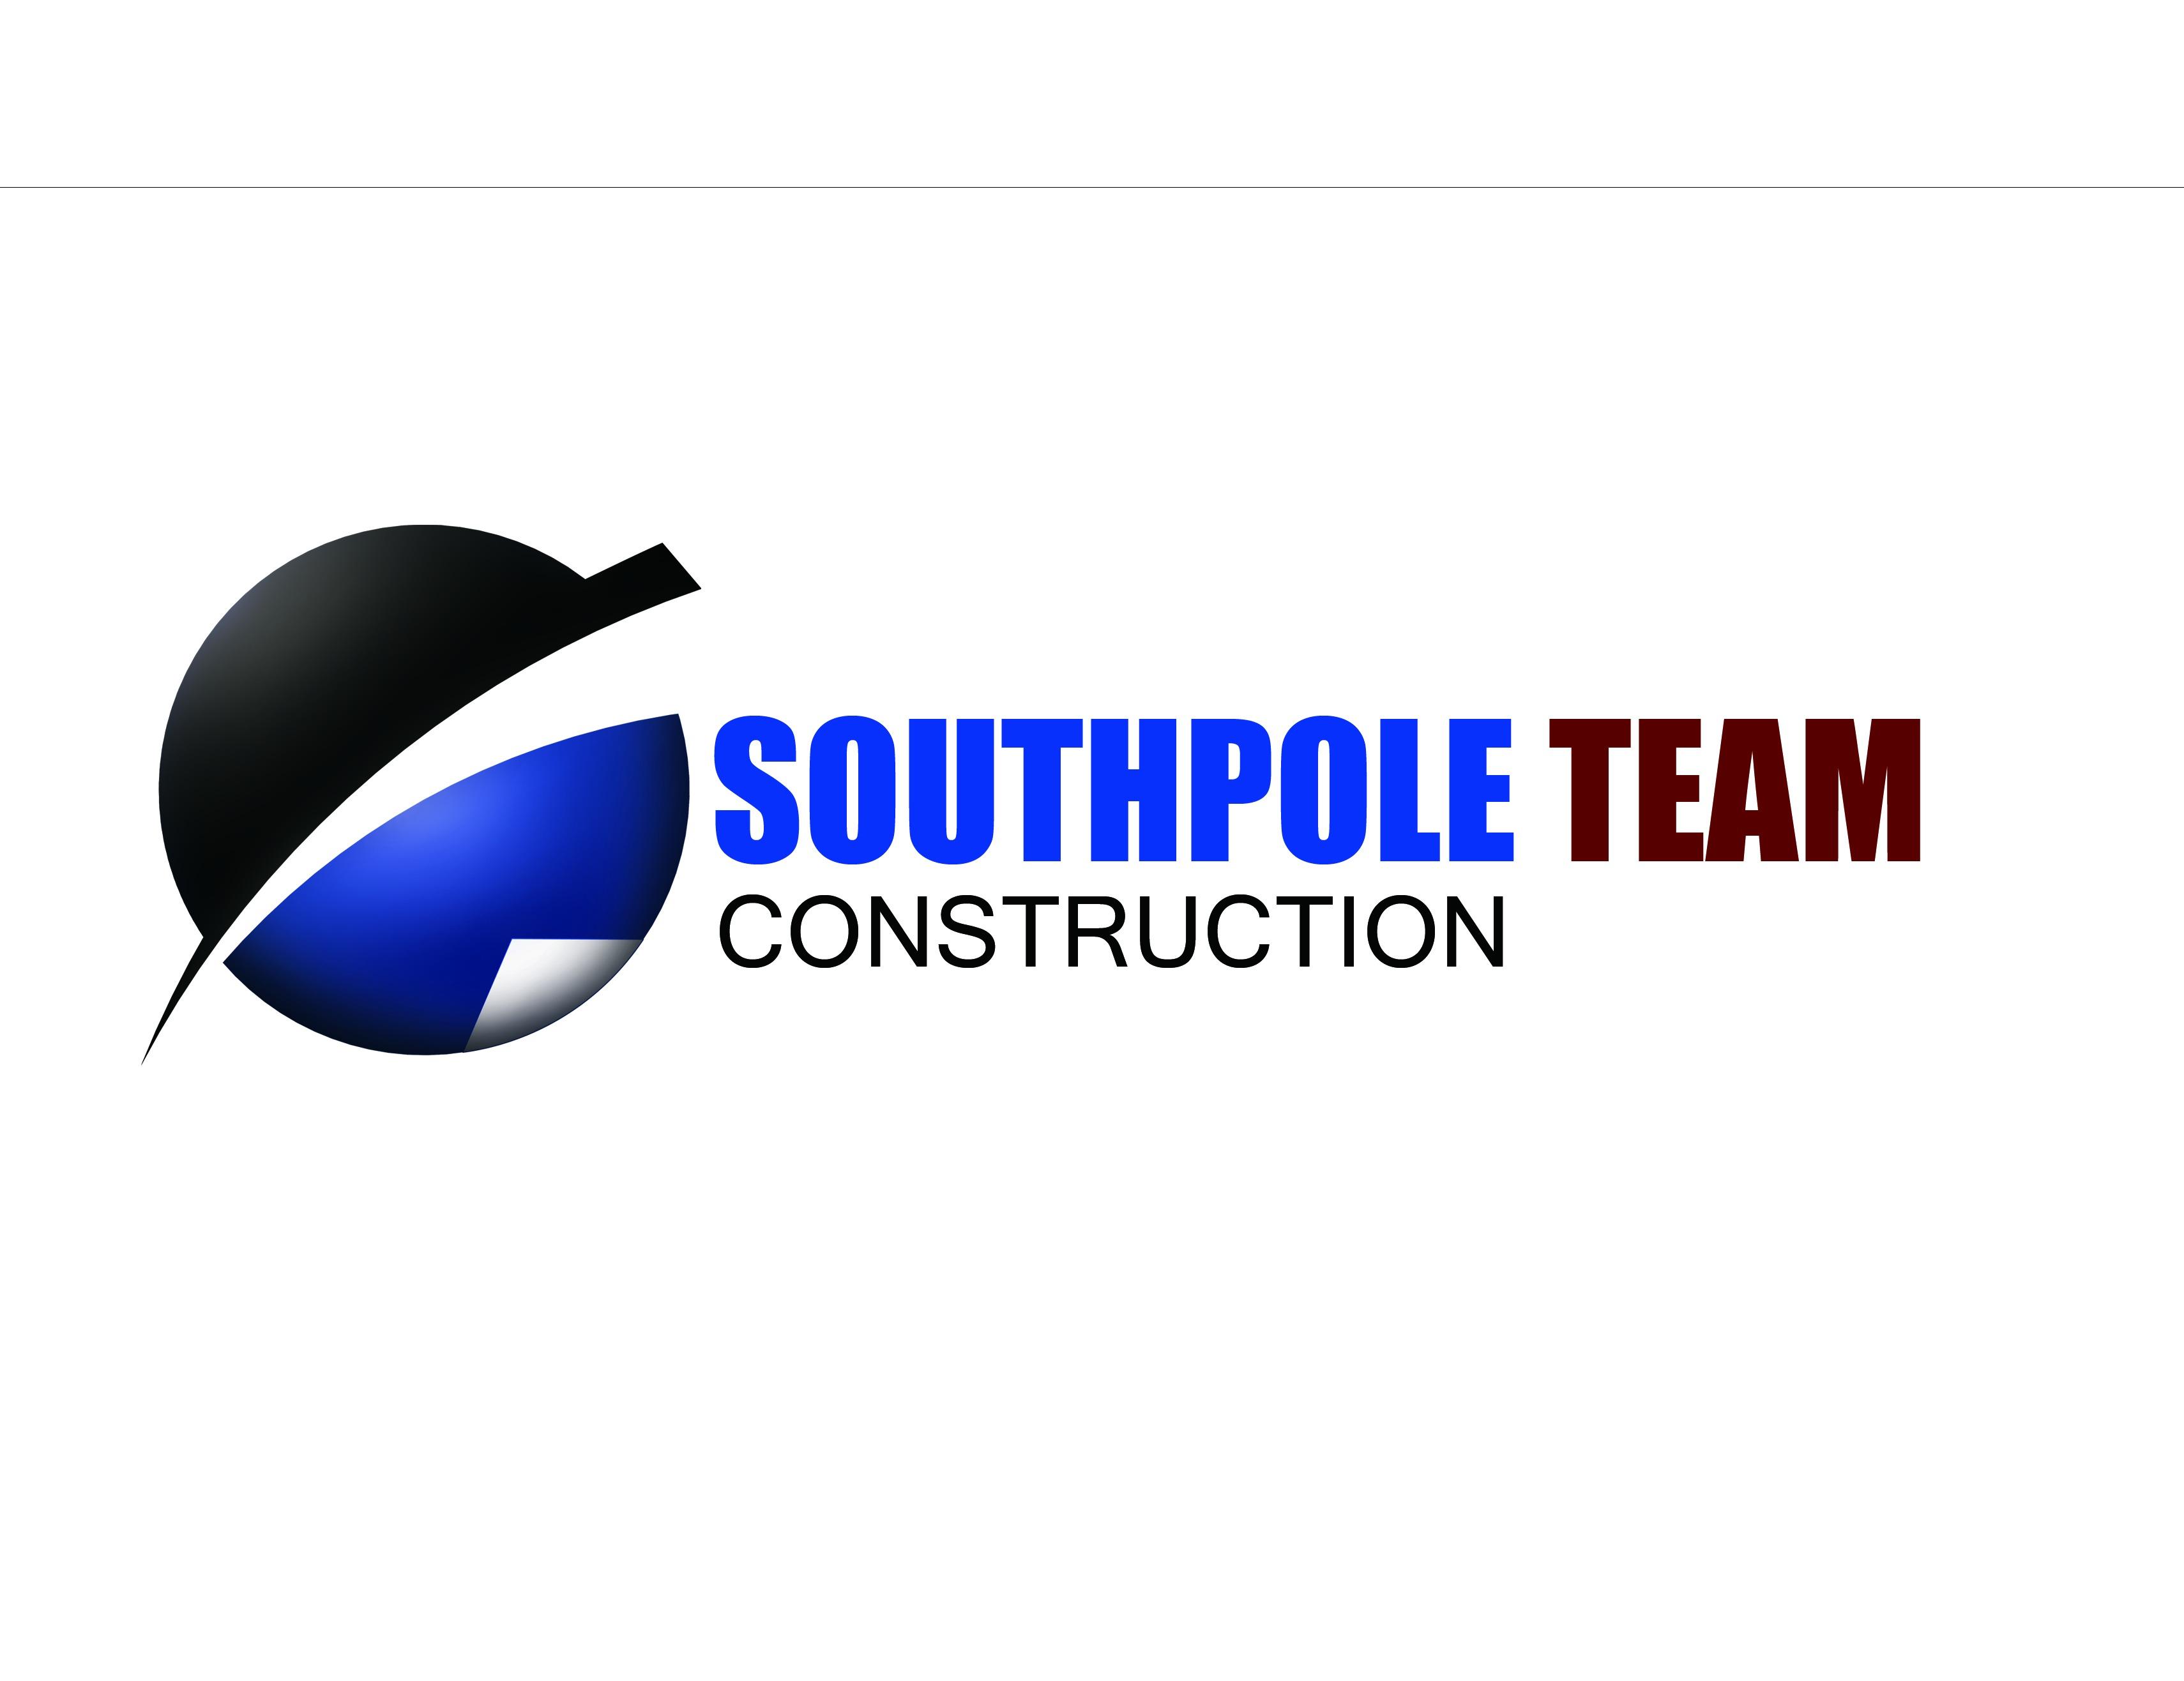 [NZSouthpole Team Ltd]